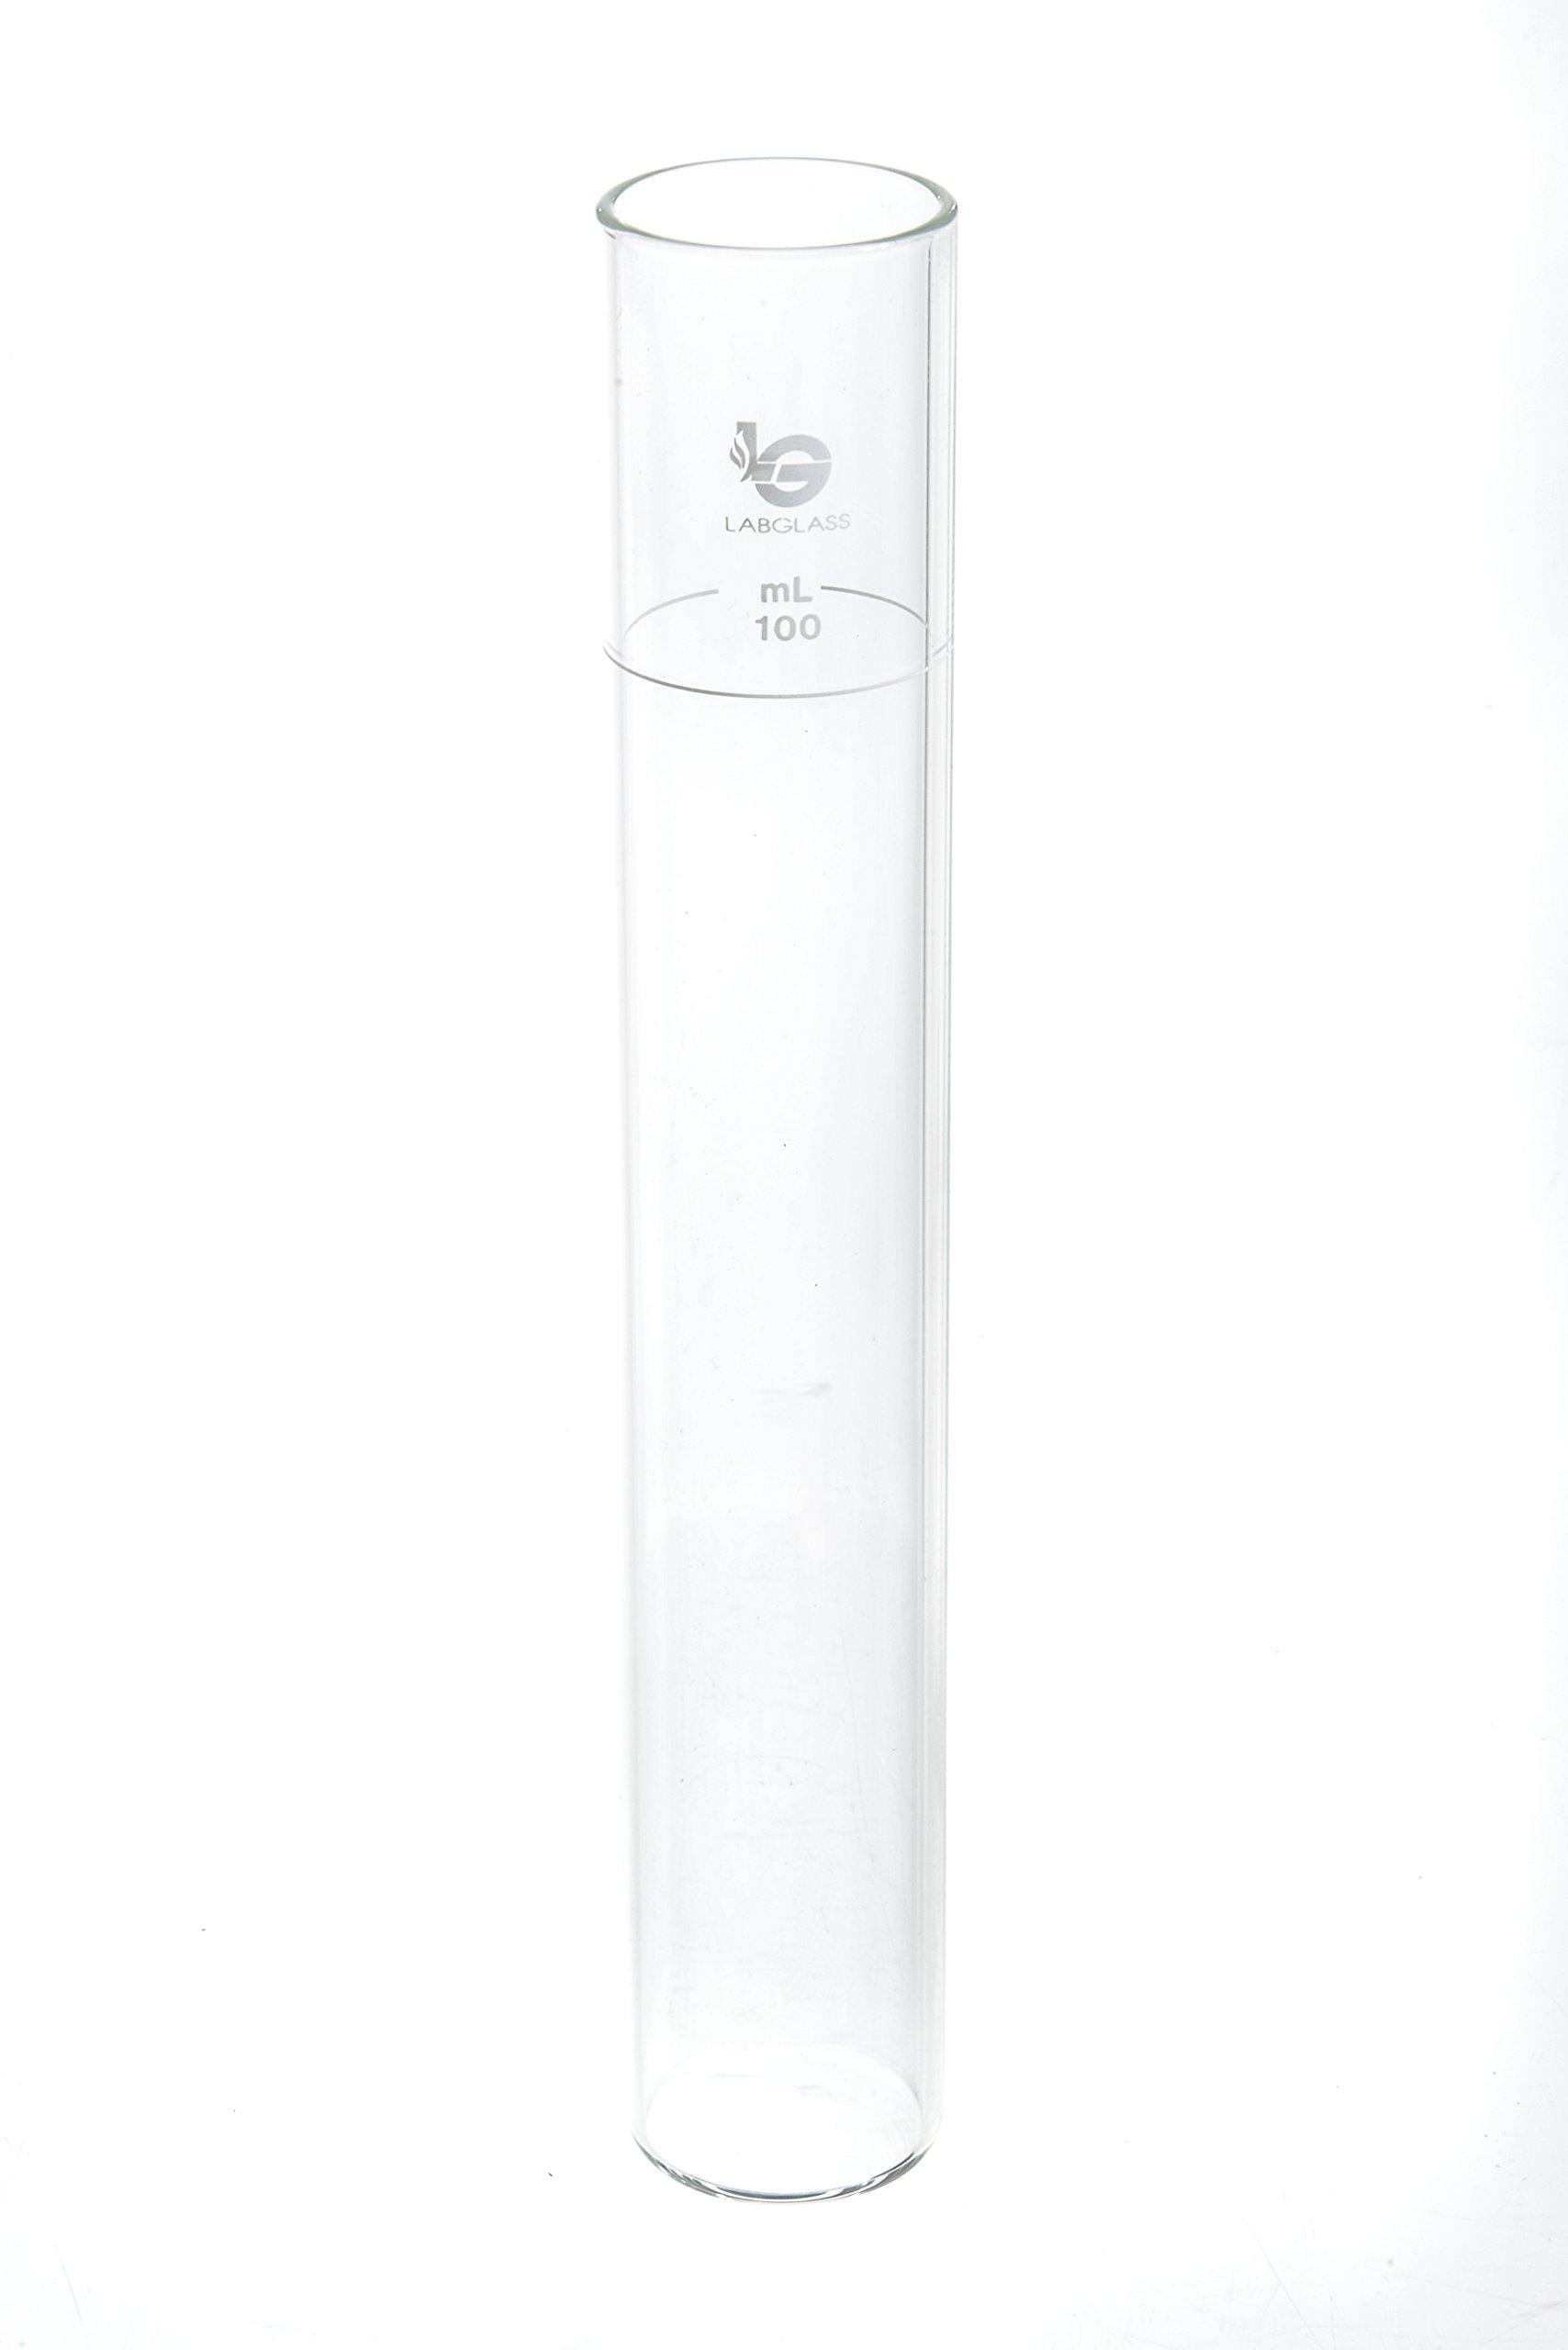 Wilmad-LabGlass LG-10715-102 Nessler Low Form Color Comparison Tube, 100mL